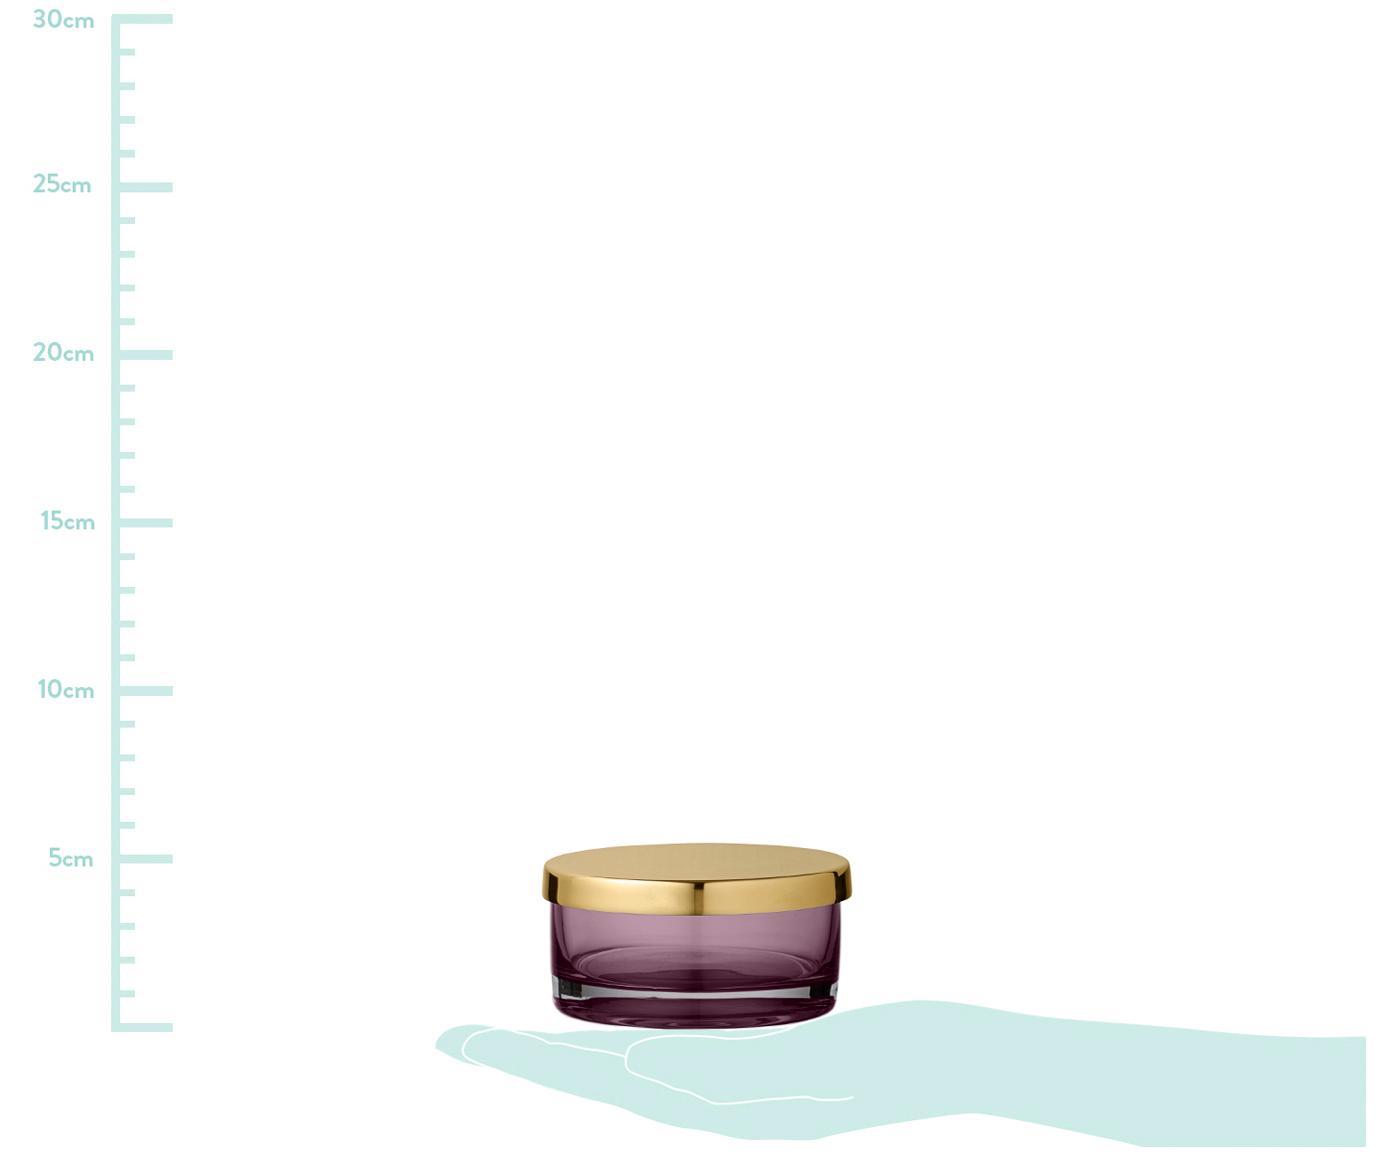 Aufbewahrungsdose Tota, Deckel: Messing, Dose: Glas, Deckel: Messing Dose: Rosa, transparent, Ø 9 x H 5 cm